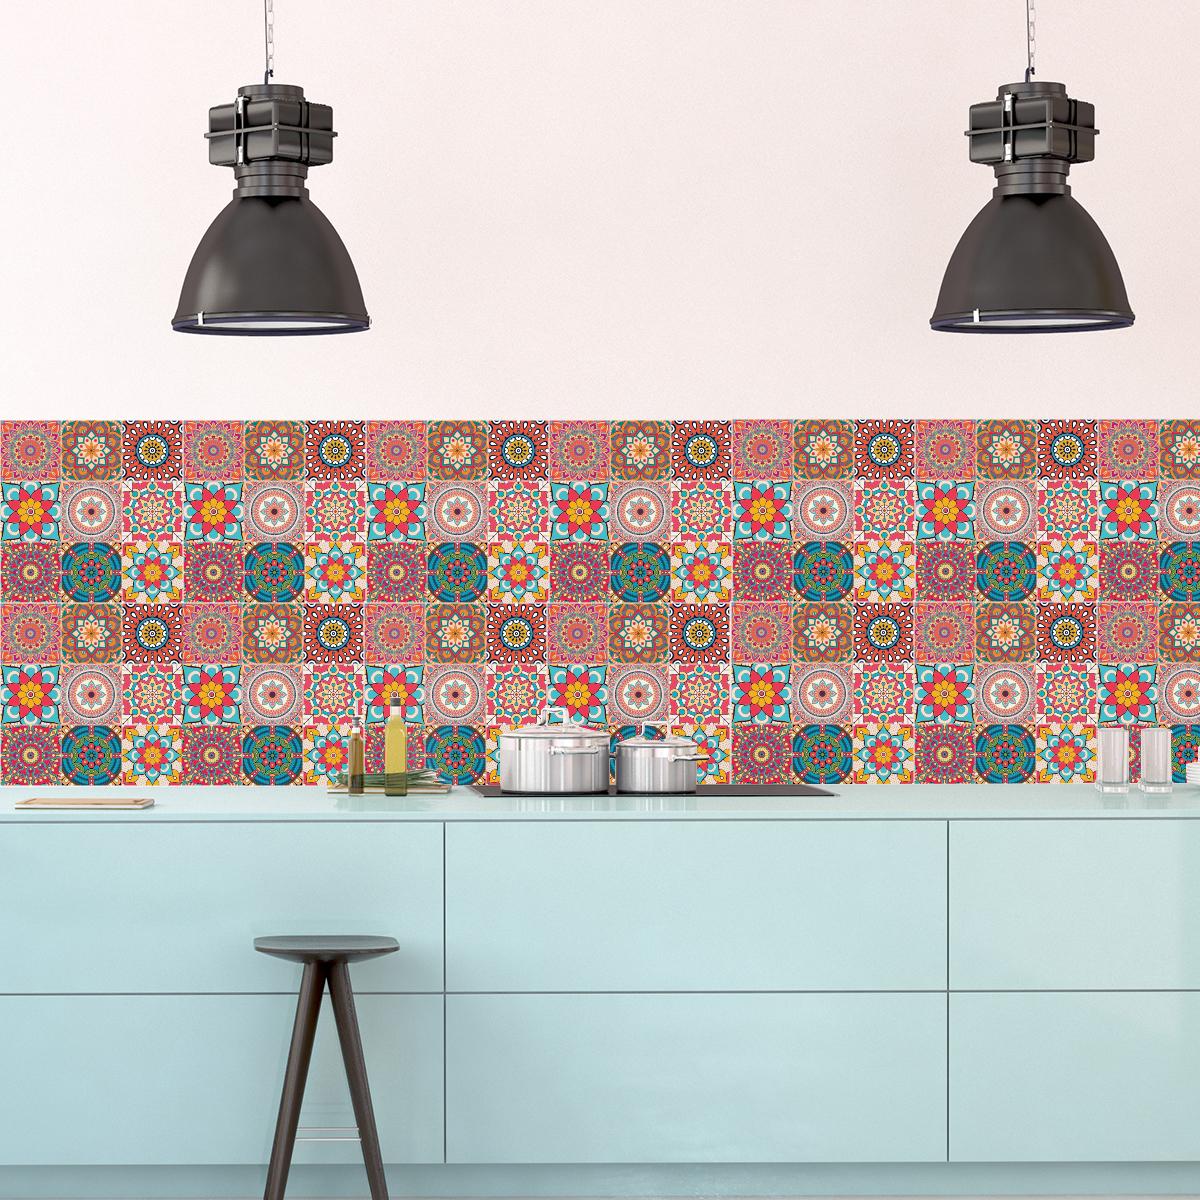 Carrelage Salle De Bain Fleuri ~ 9 stickers carrelages azulejos mandala salle de bain et wc salle